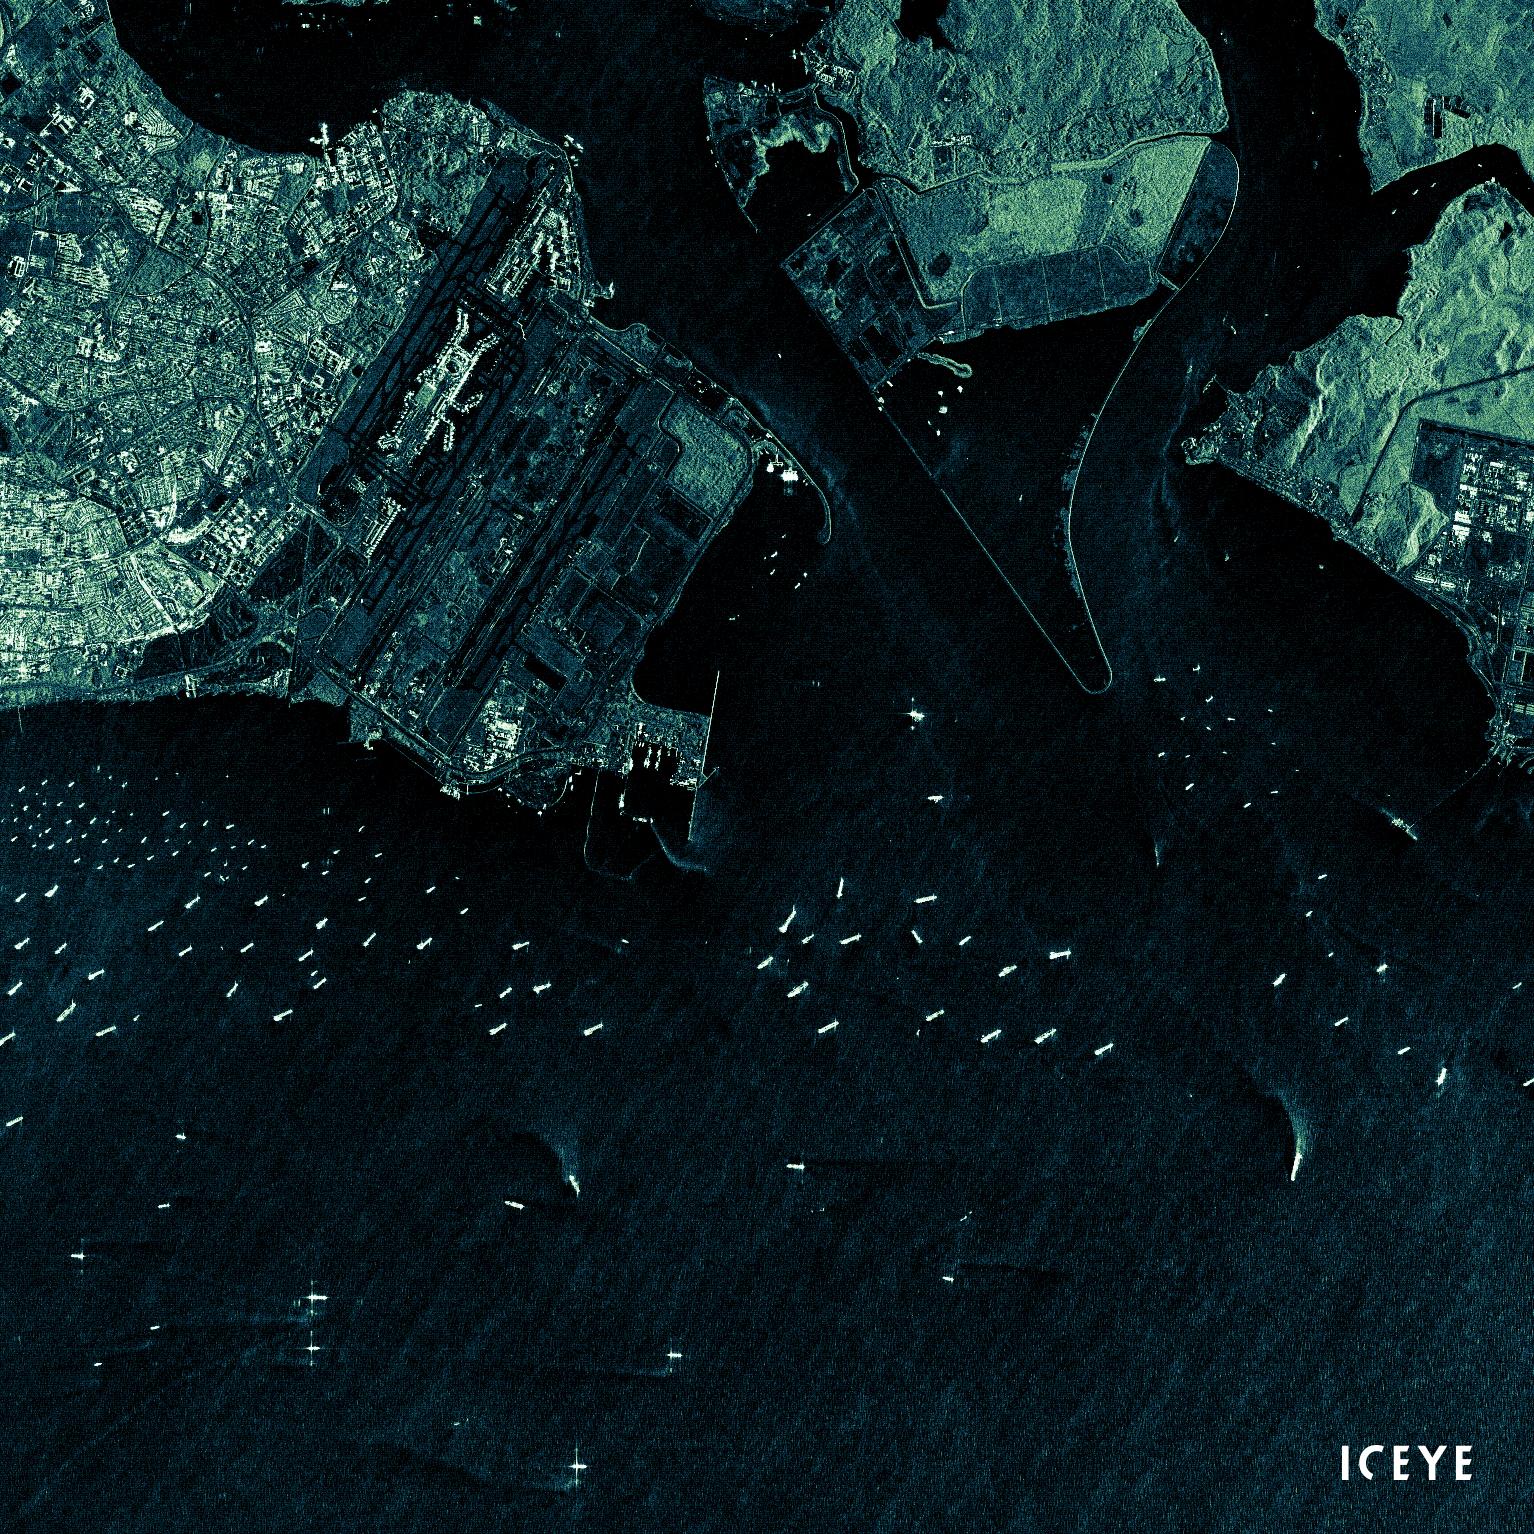 Dark-Vessel-Detection-Singapore-ICEYE-SA